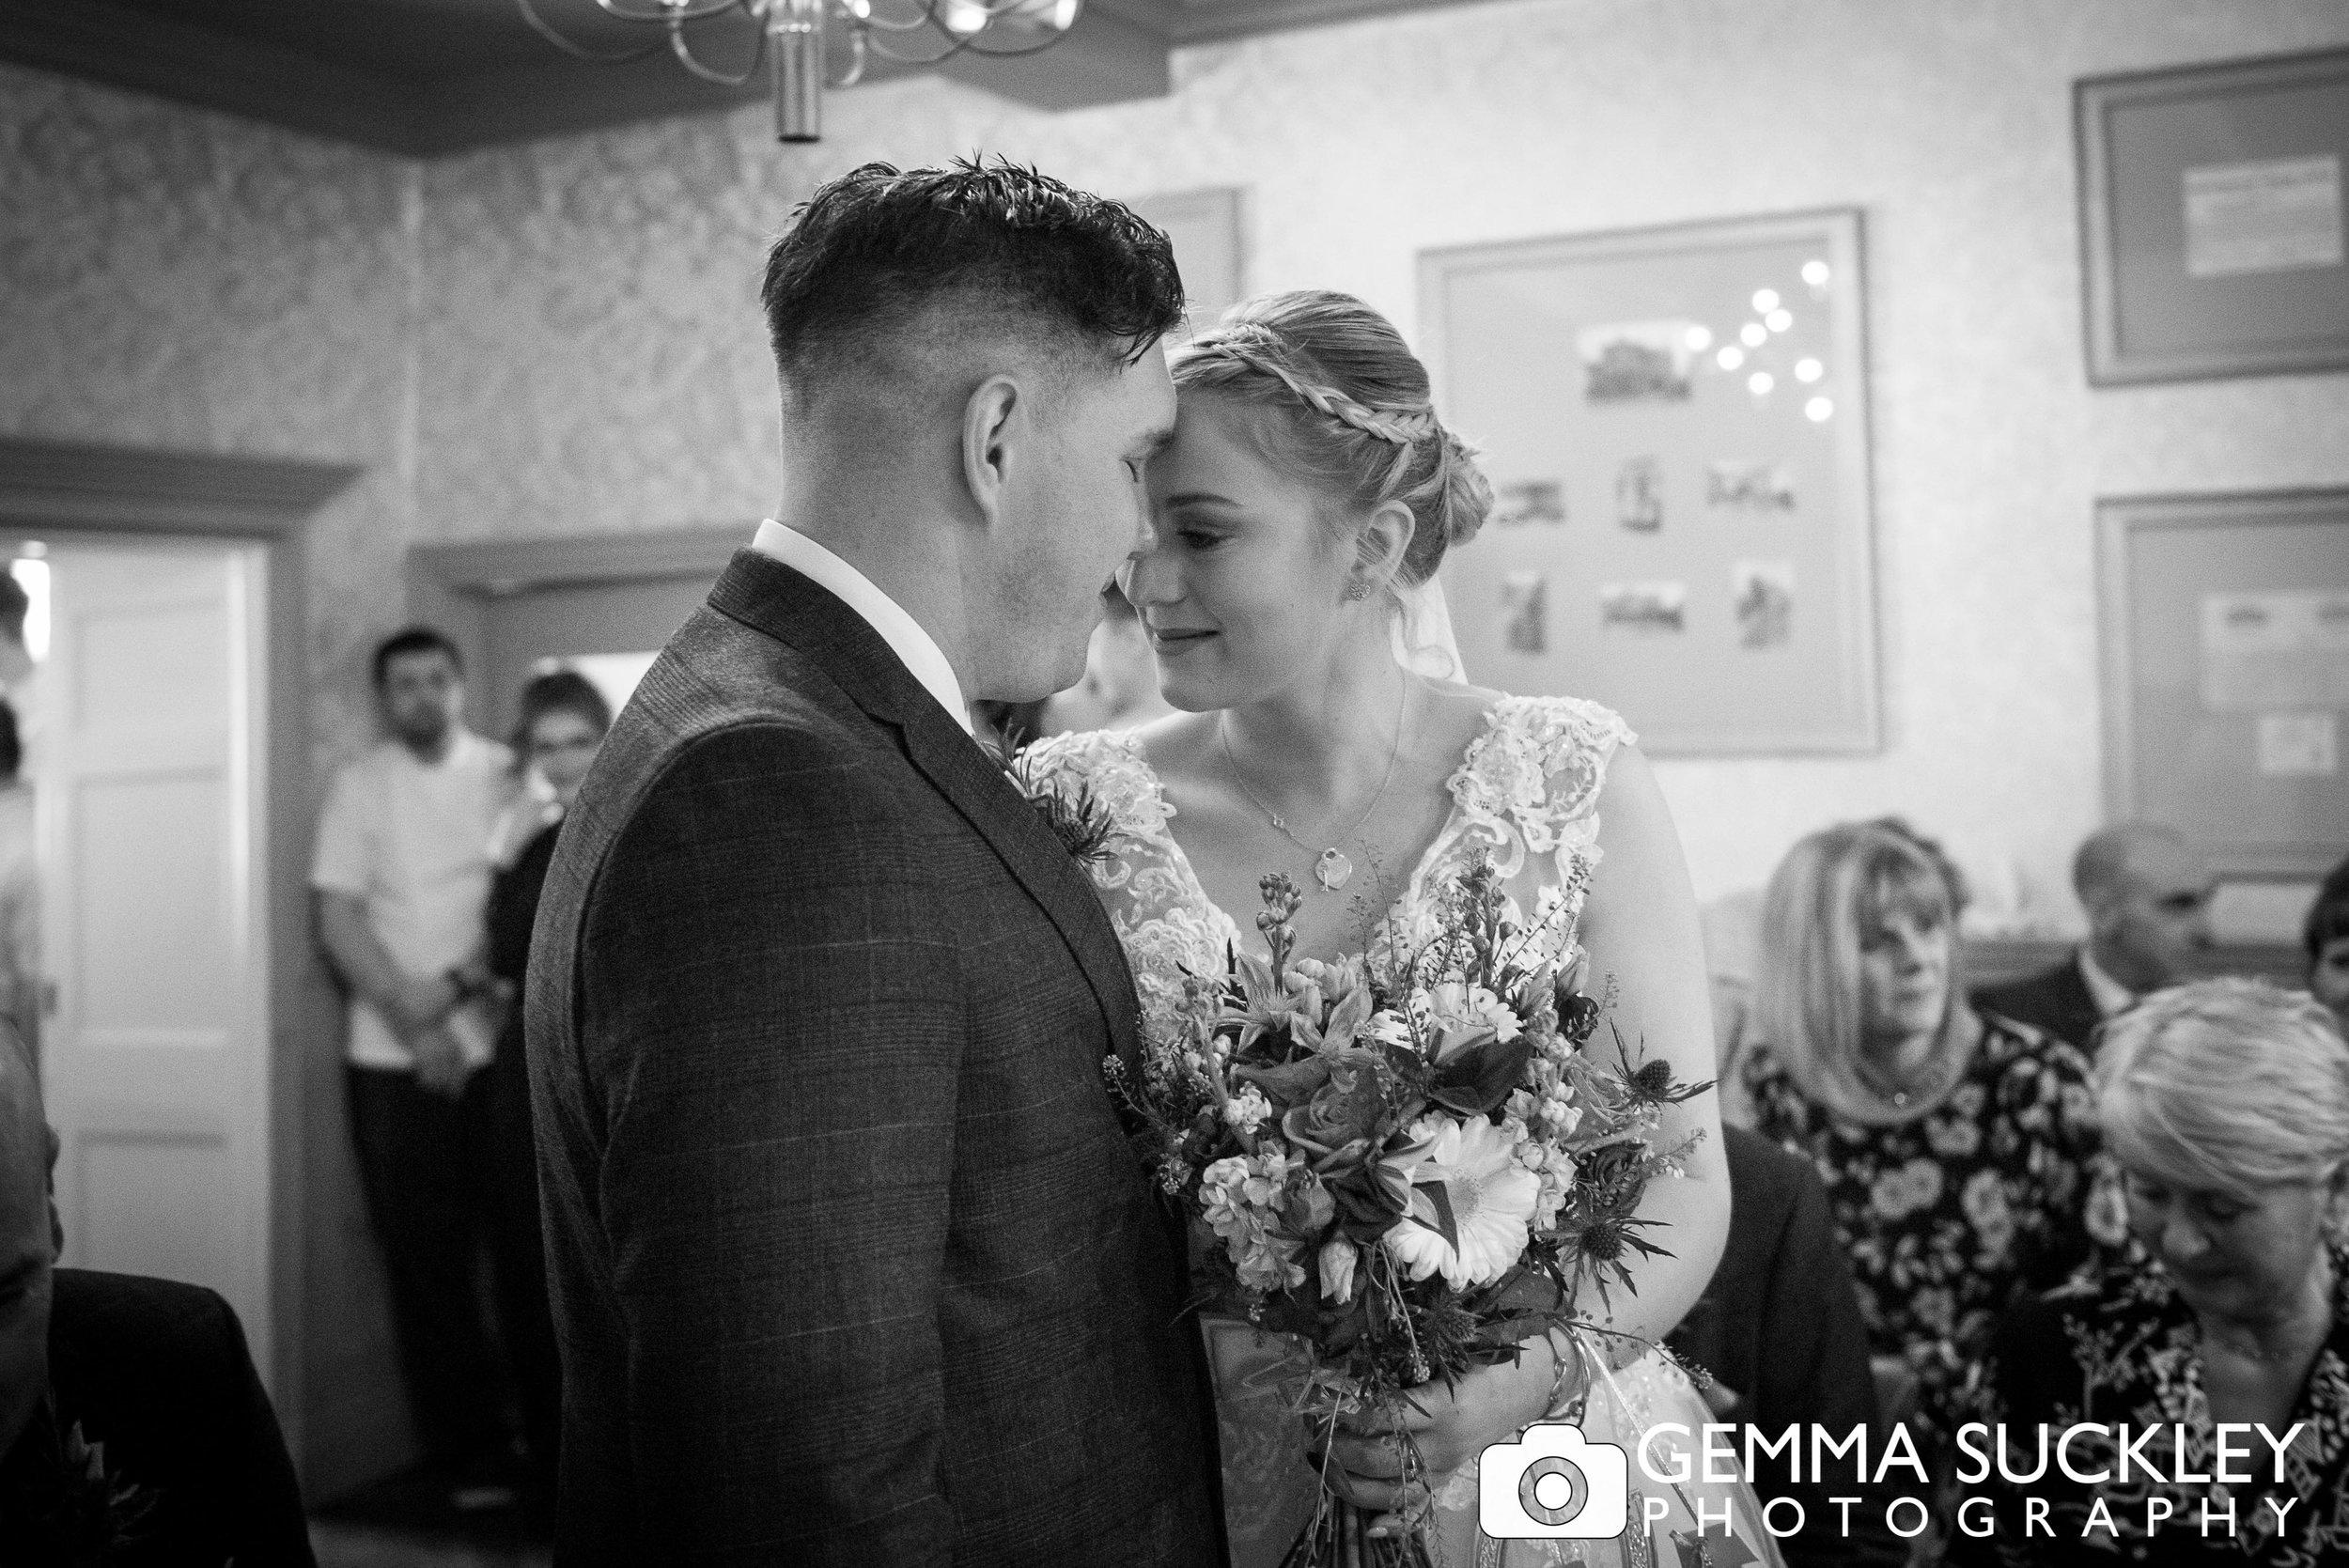 emotional photo of bride and groom during grassington house wedding ceremony